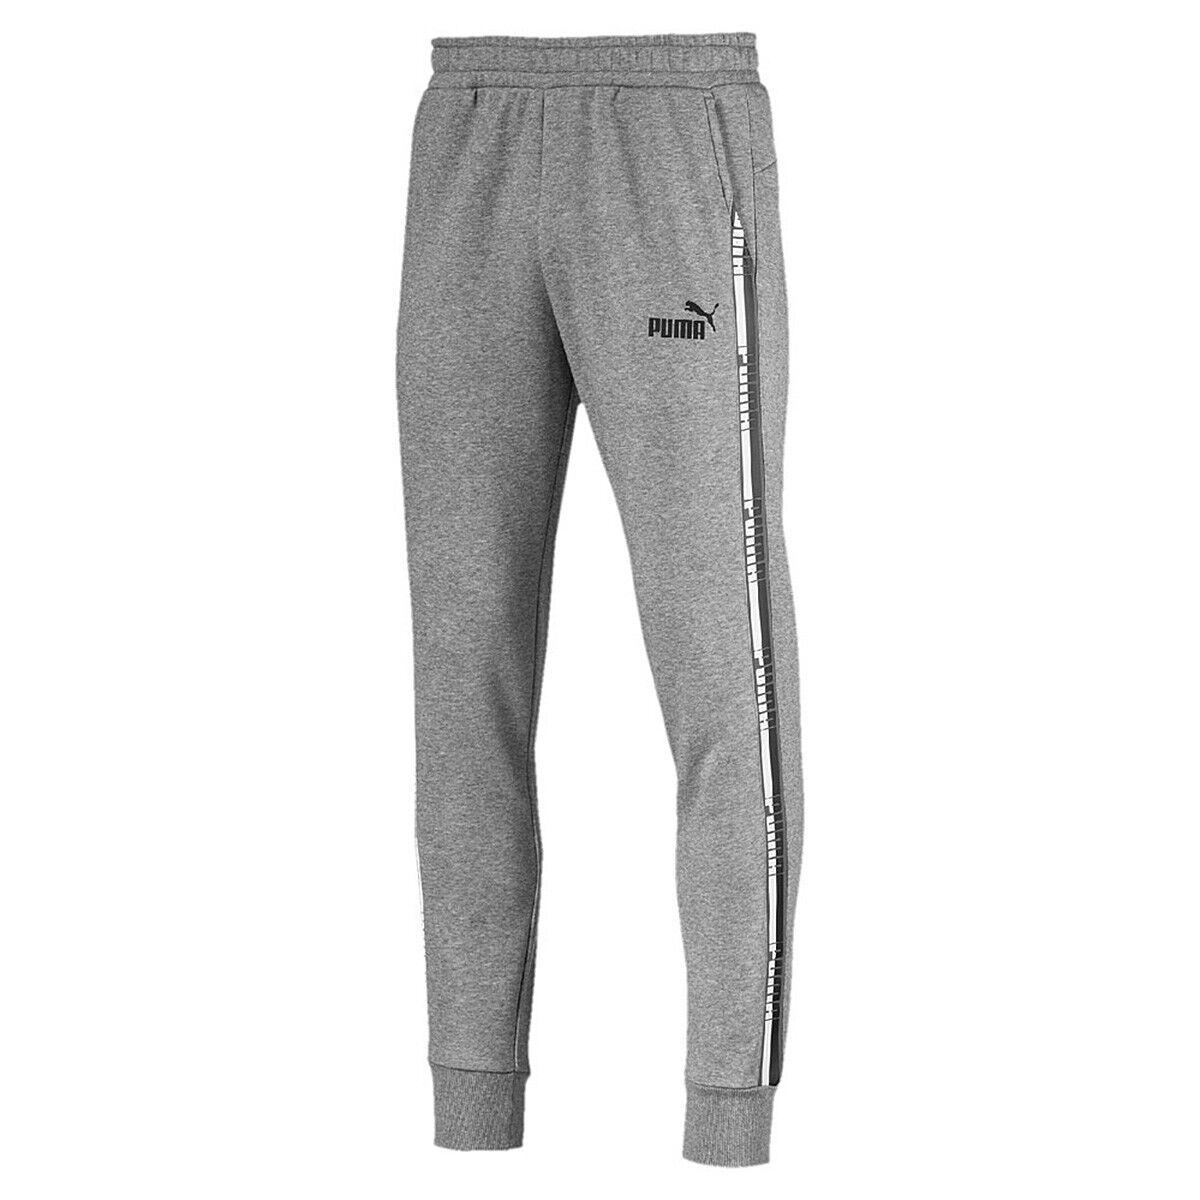 d9a95cb8379569 Tape Pants Sports Shorts Training Trousers 852418 03 Grey Puma Men s ...